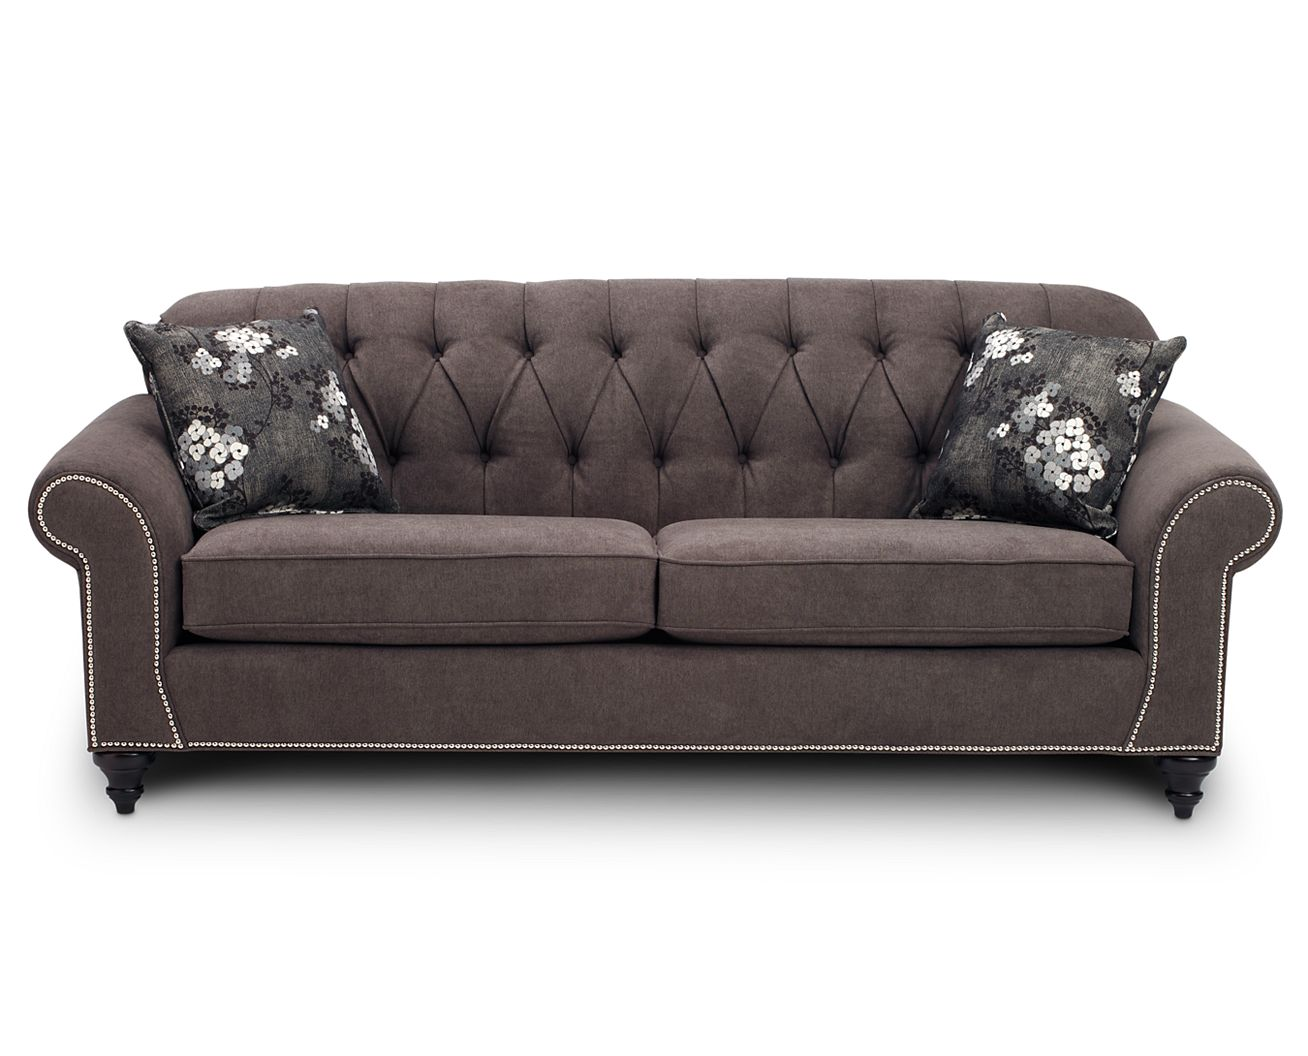 Elegant Living Room Furniture Stylish Sofas Furniture